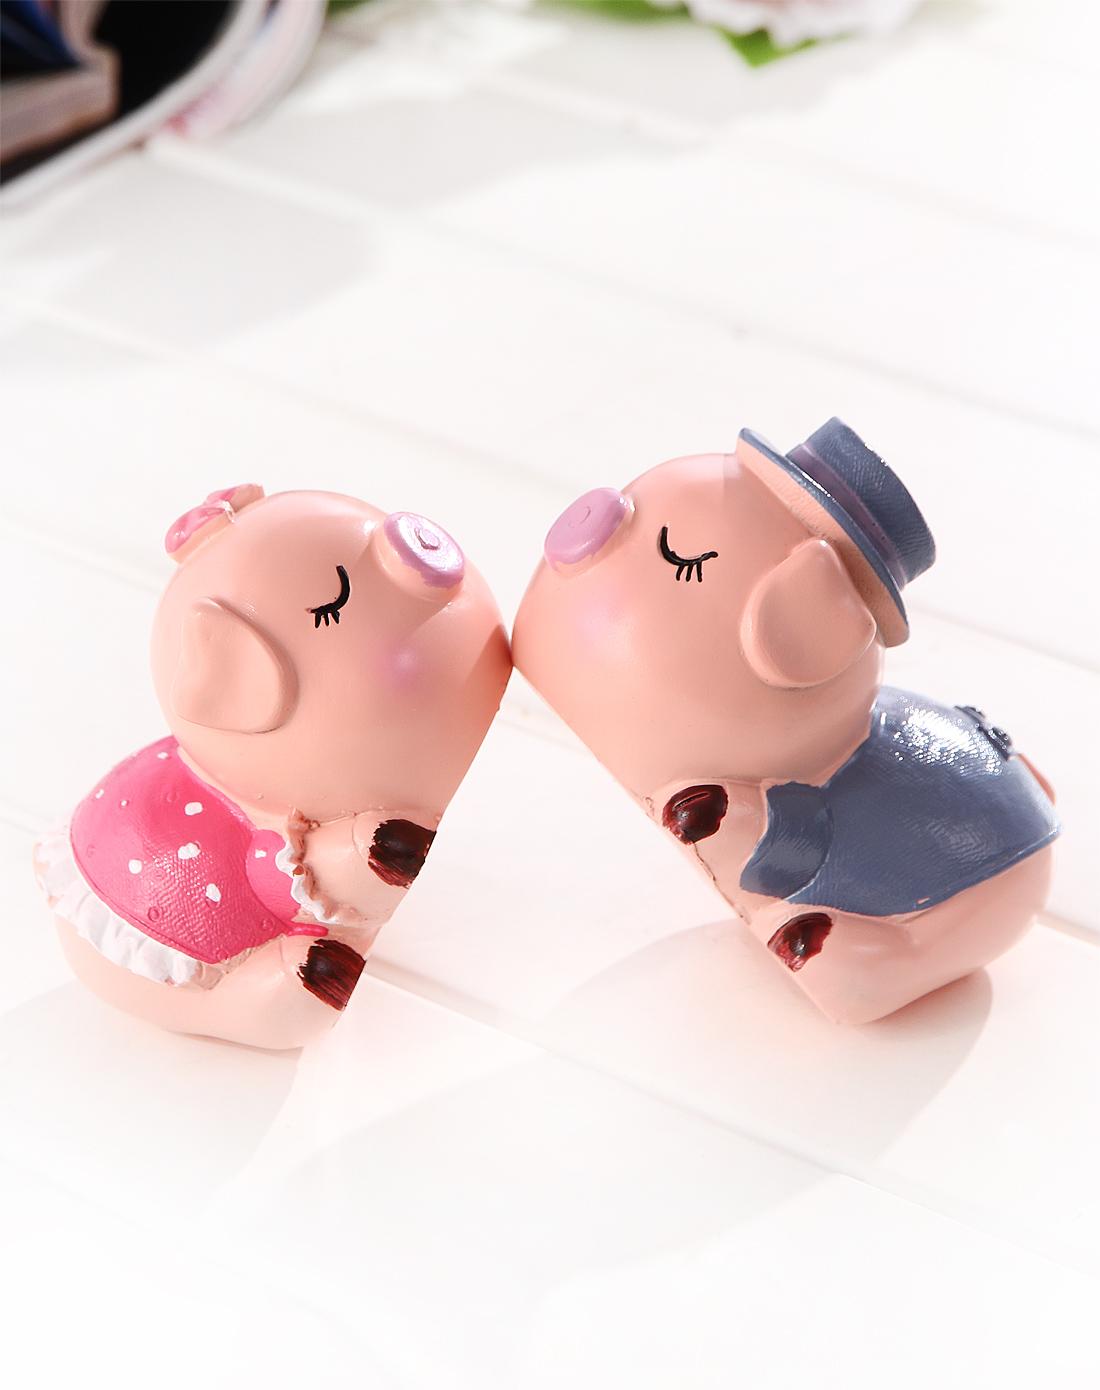 h&3 / 可爱亲嘴粉色小猪树脂摆件 2入